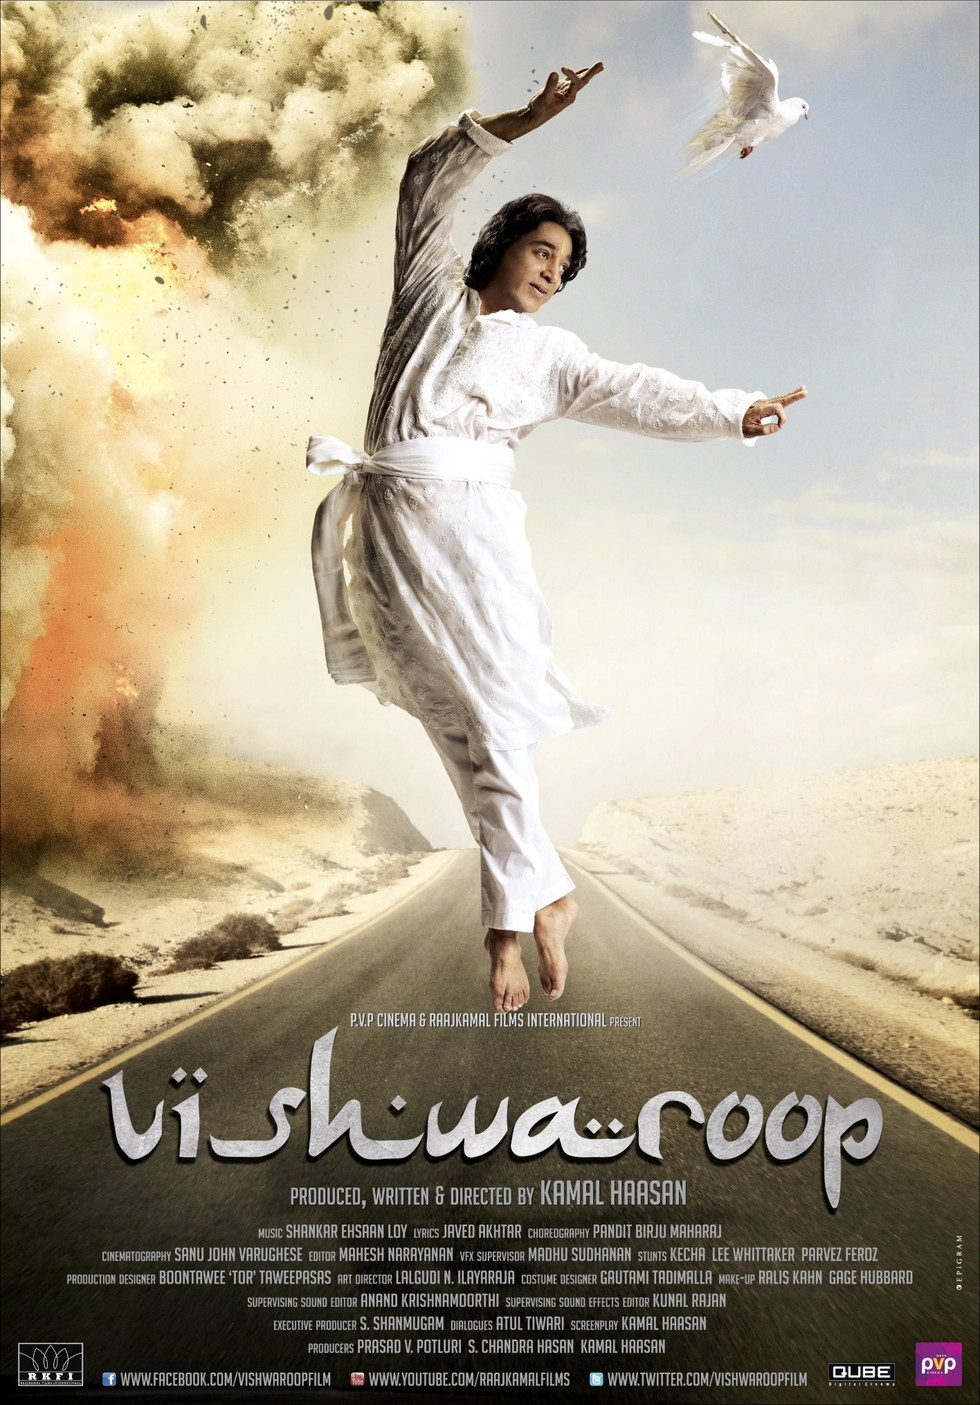 Vishwaroop - Movie Poster #4 (Large)